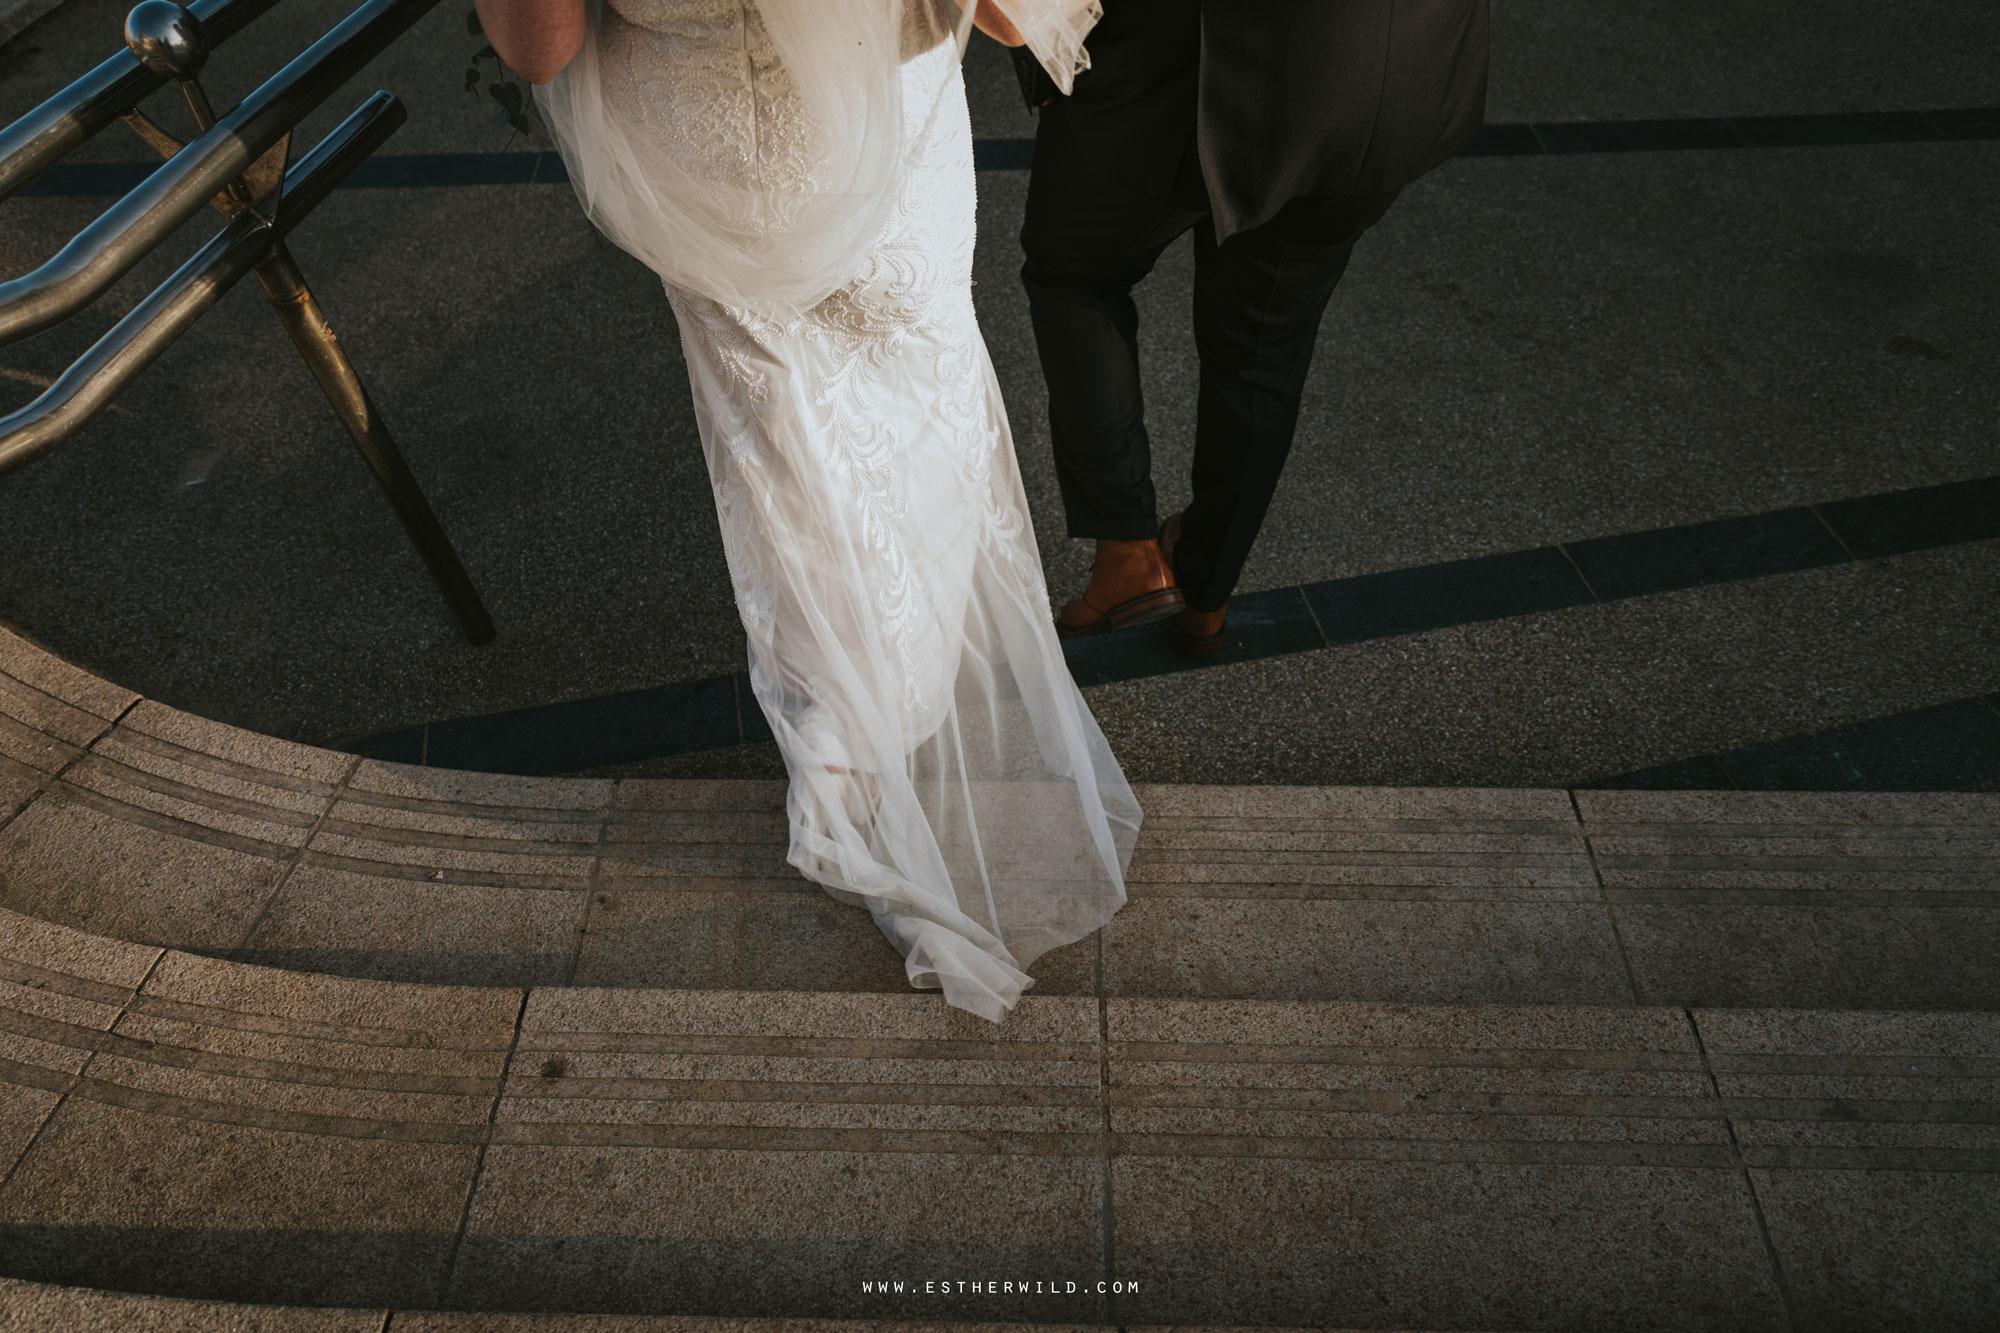 Cromer_Wedding_Beach_Outdoor_Ceremony_Norfolk_North_Lodge_Registry_Office_Rocket_House_Cafe_Cromer_Pier_IMG_4701.jpg